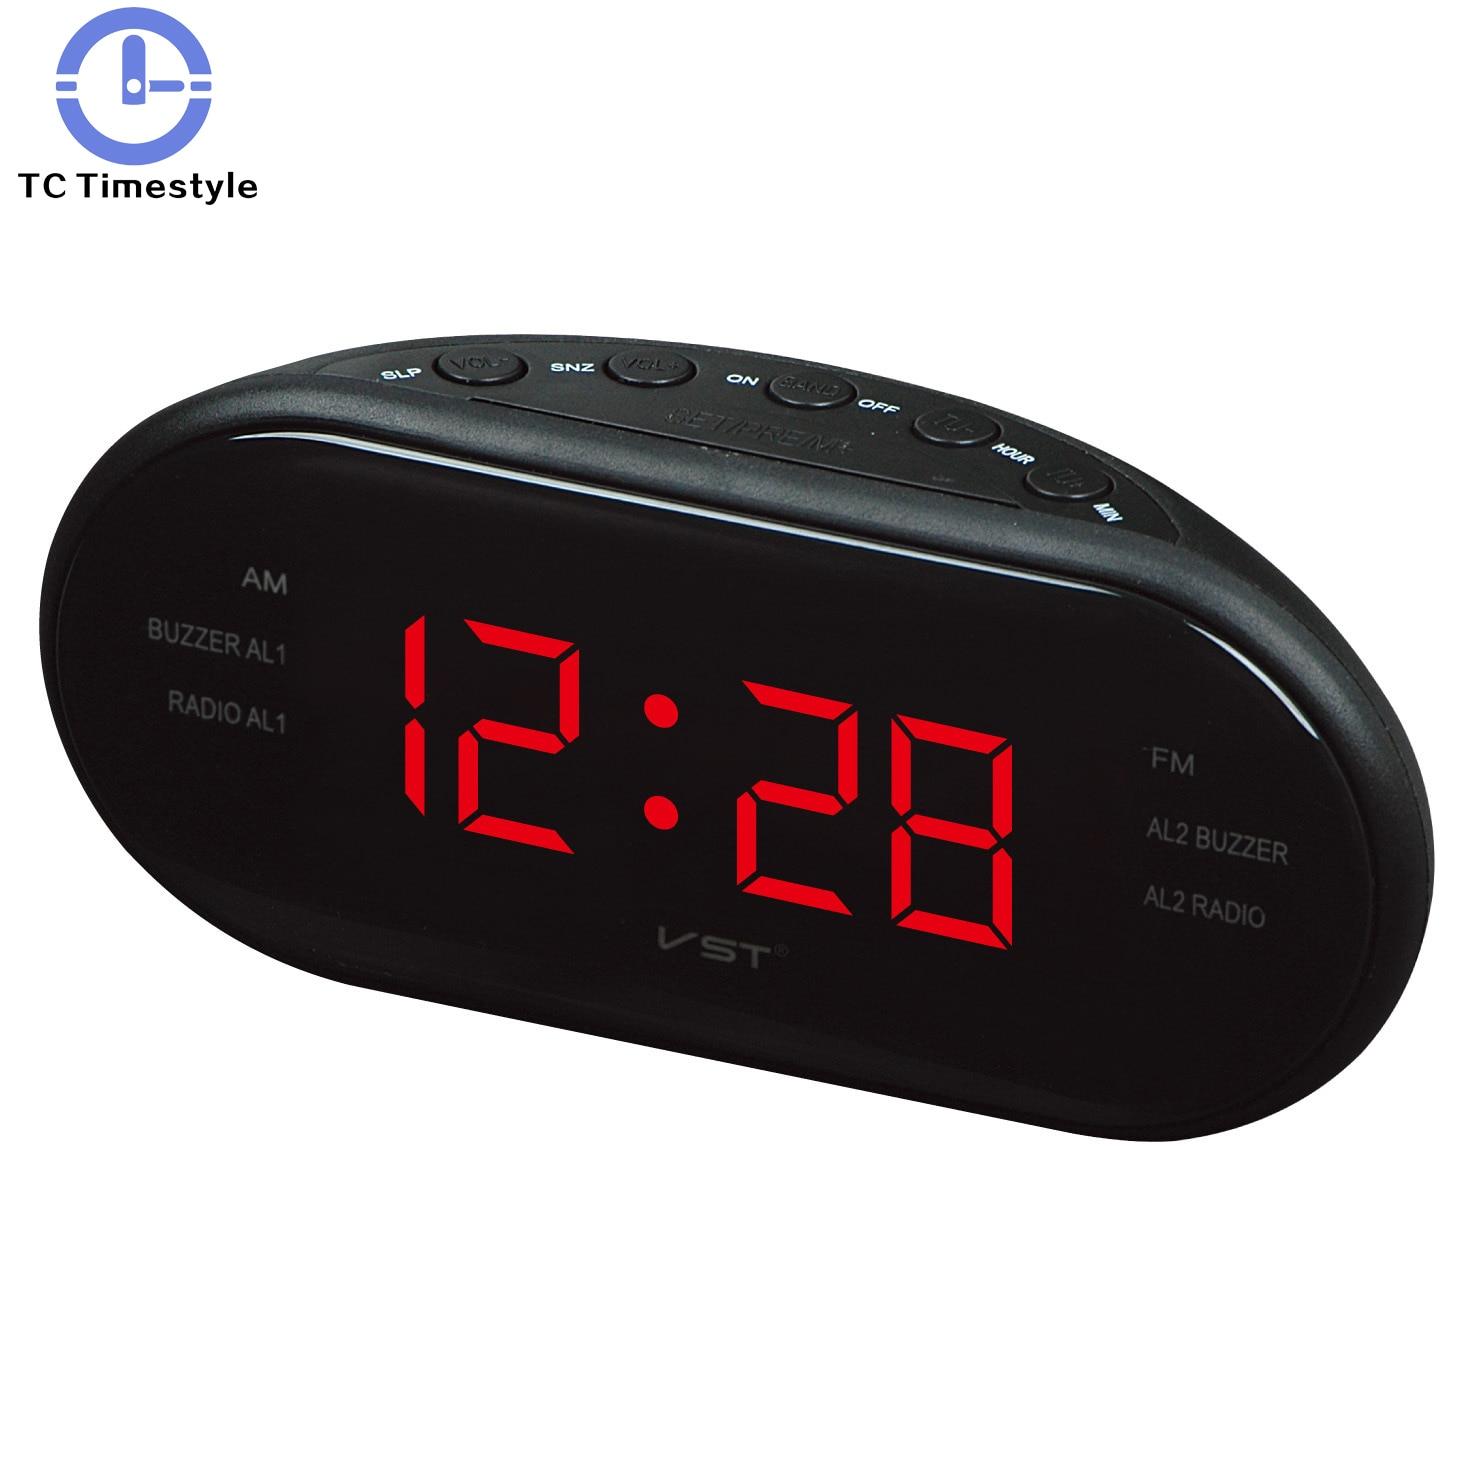 Led Camera Da Letto us $19.26 14% off|led alarm clock radio watch electronic table reveil  electronic alarm clocks office decoration desk sveglia camera da  letto|alarm